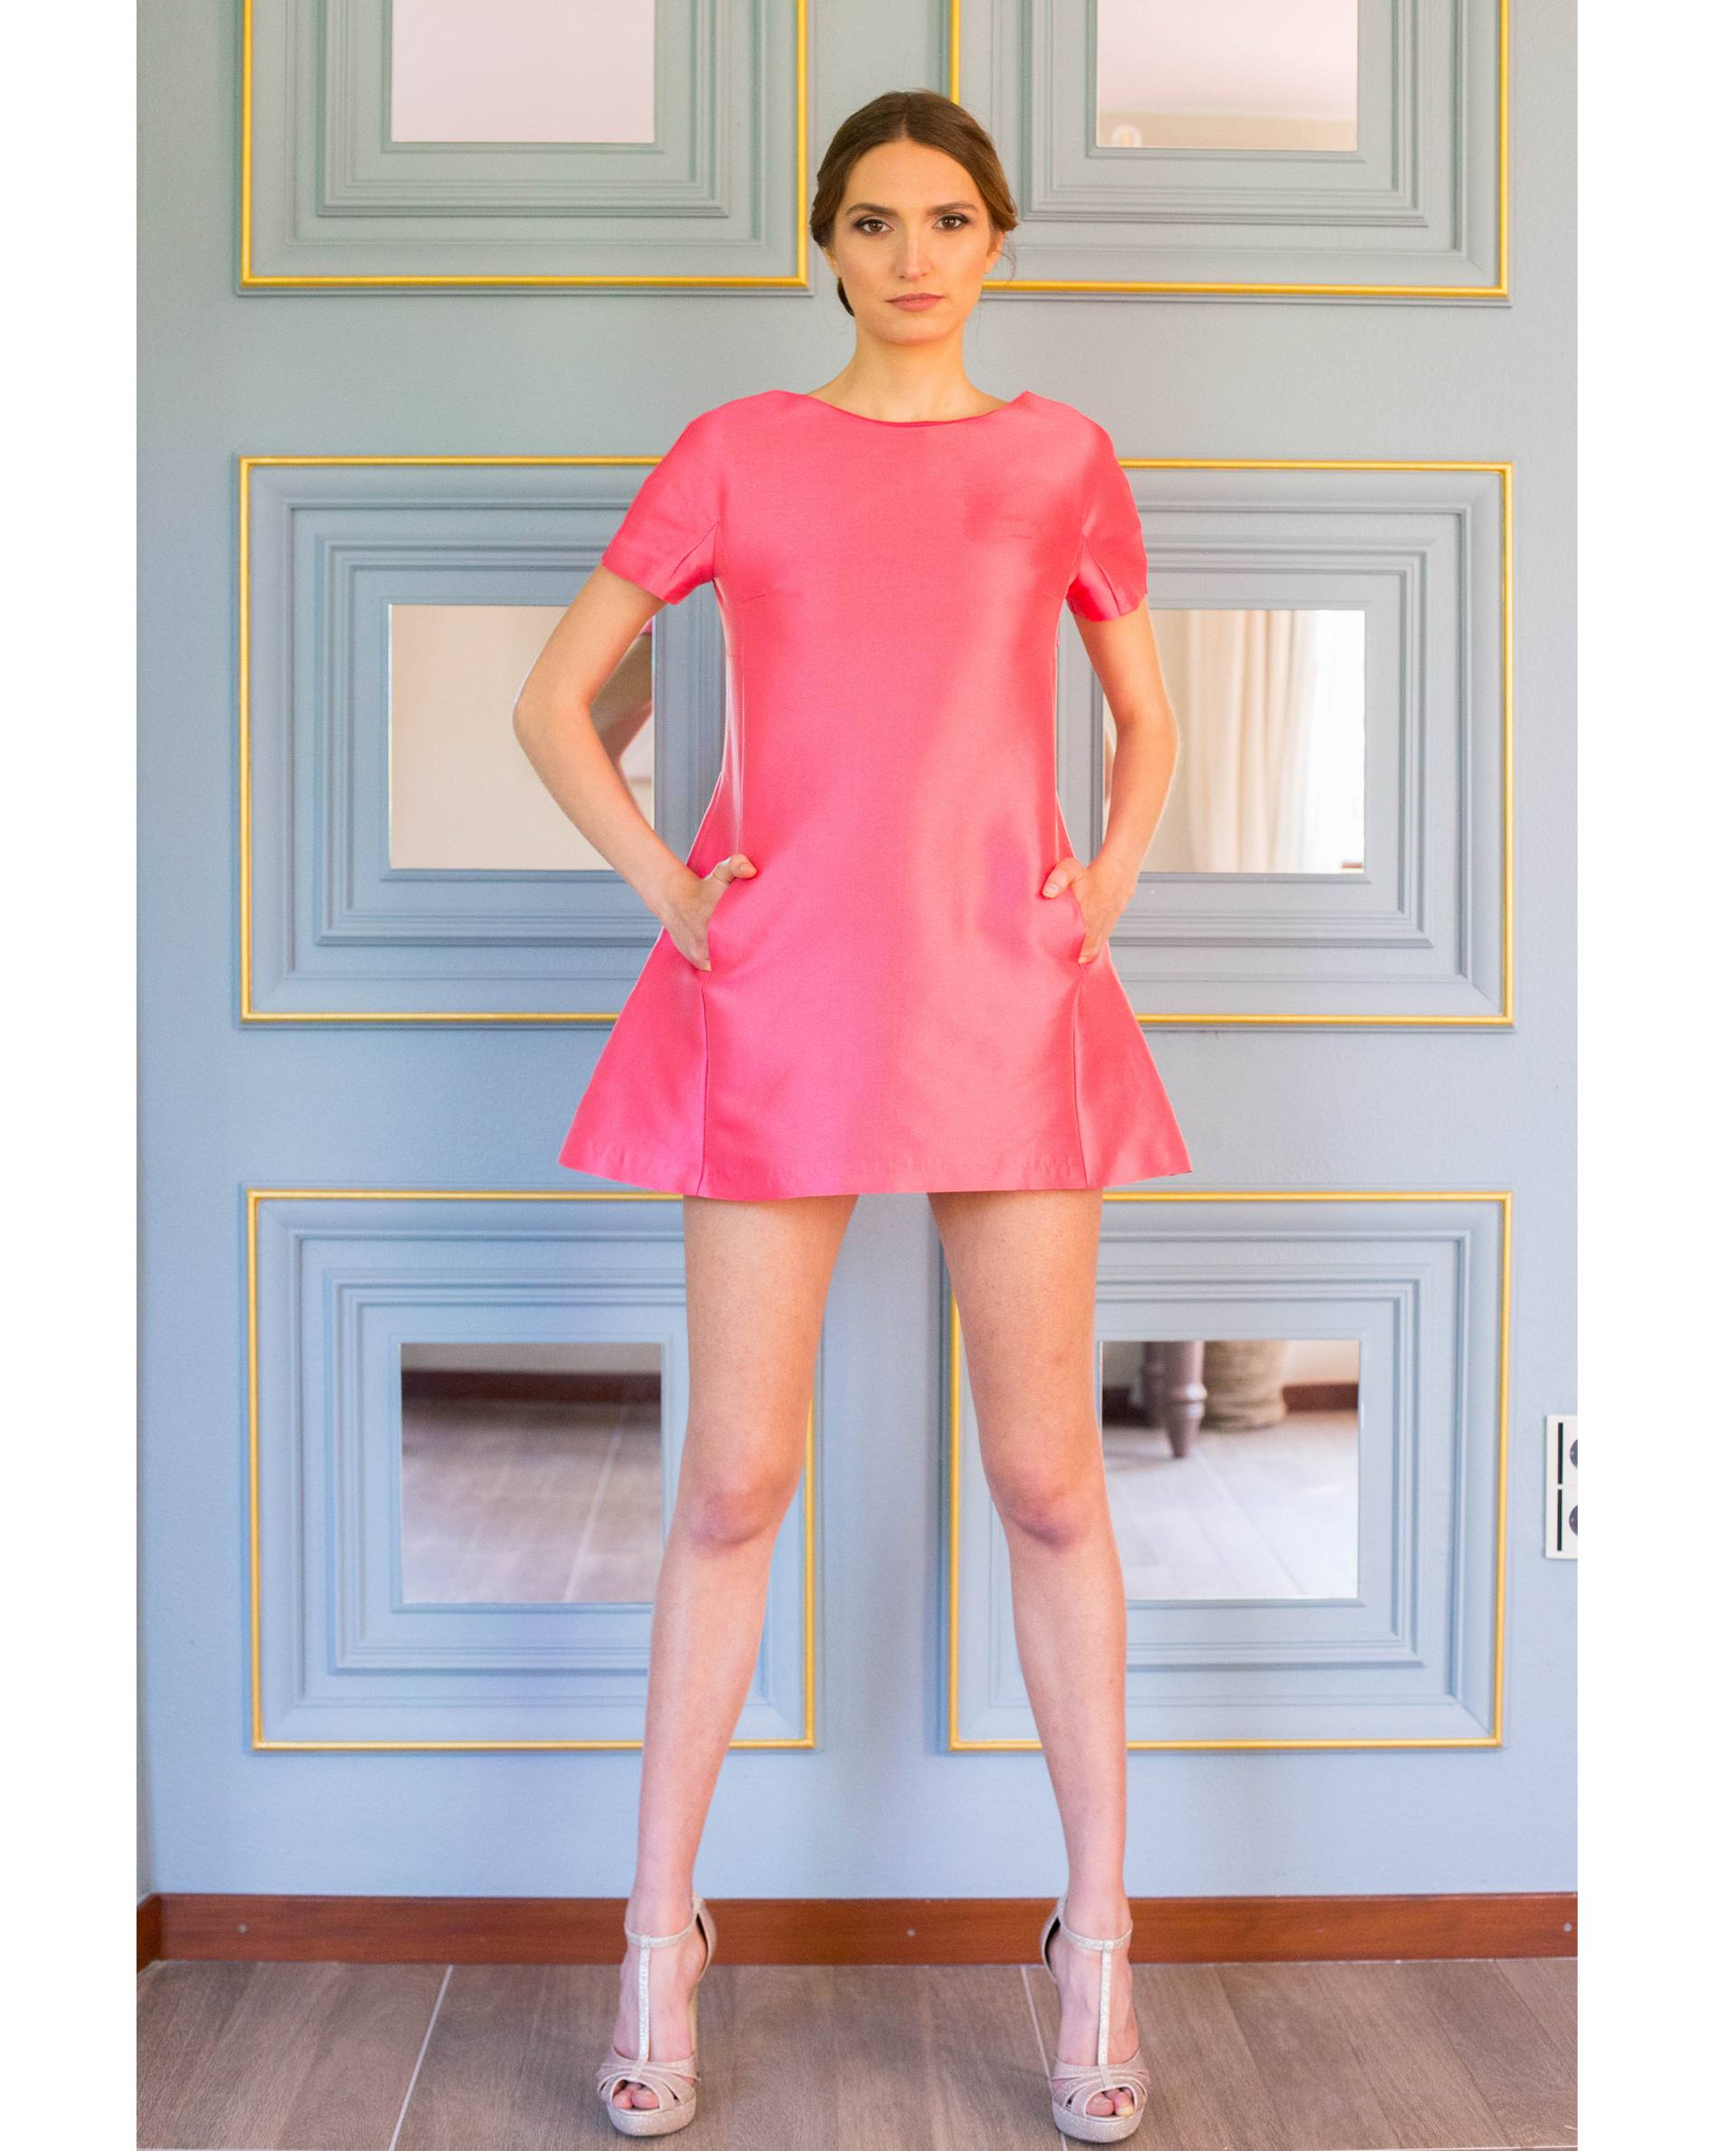 ATELIER-NATURE 2017/18 - VESTIDOS - vestido fiesta MARTINA rosa